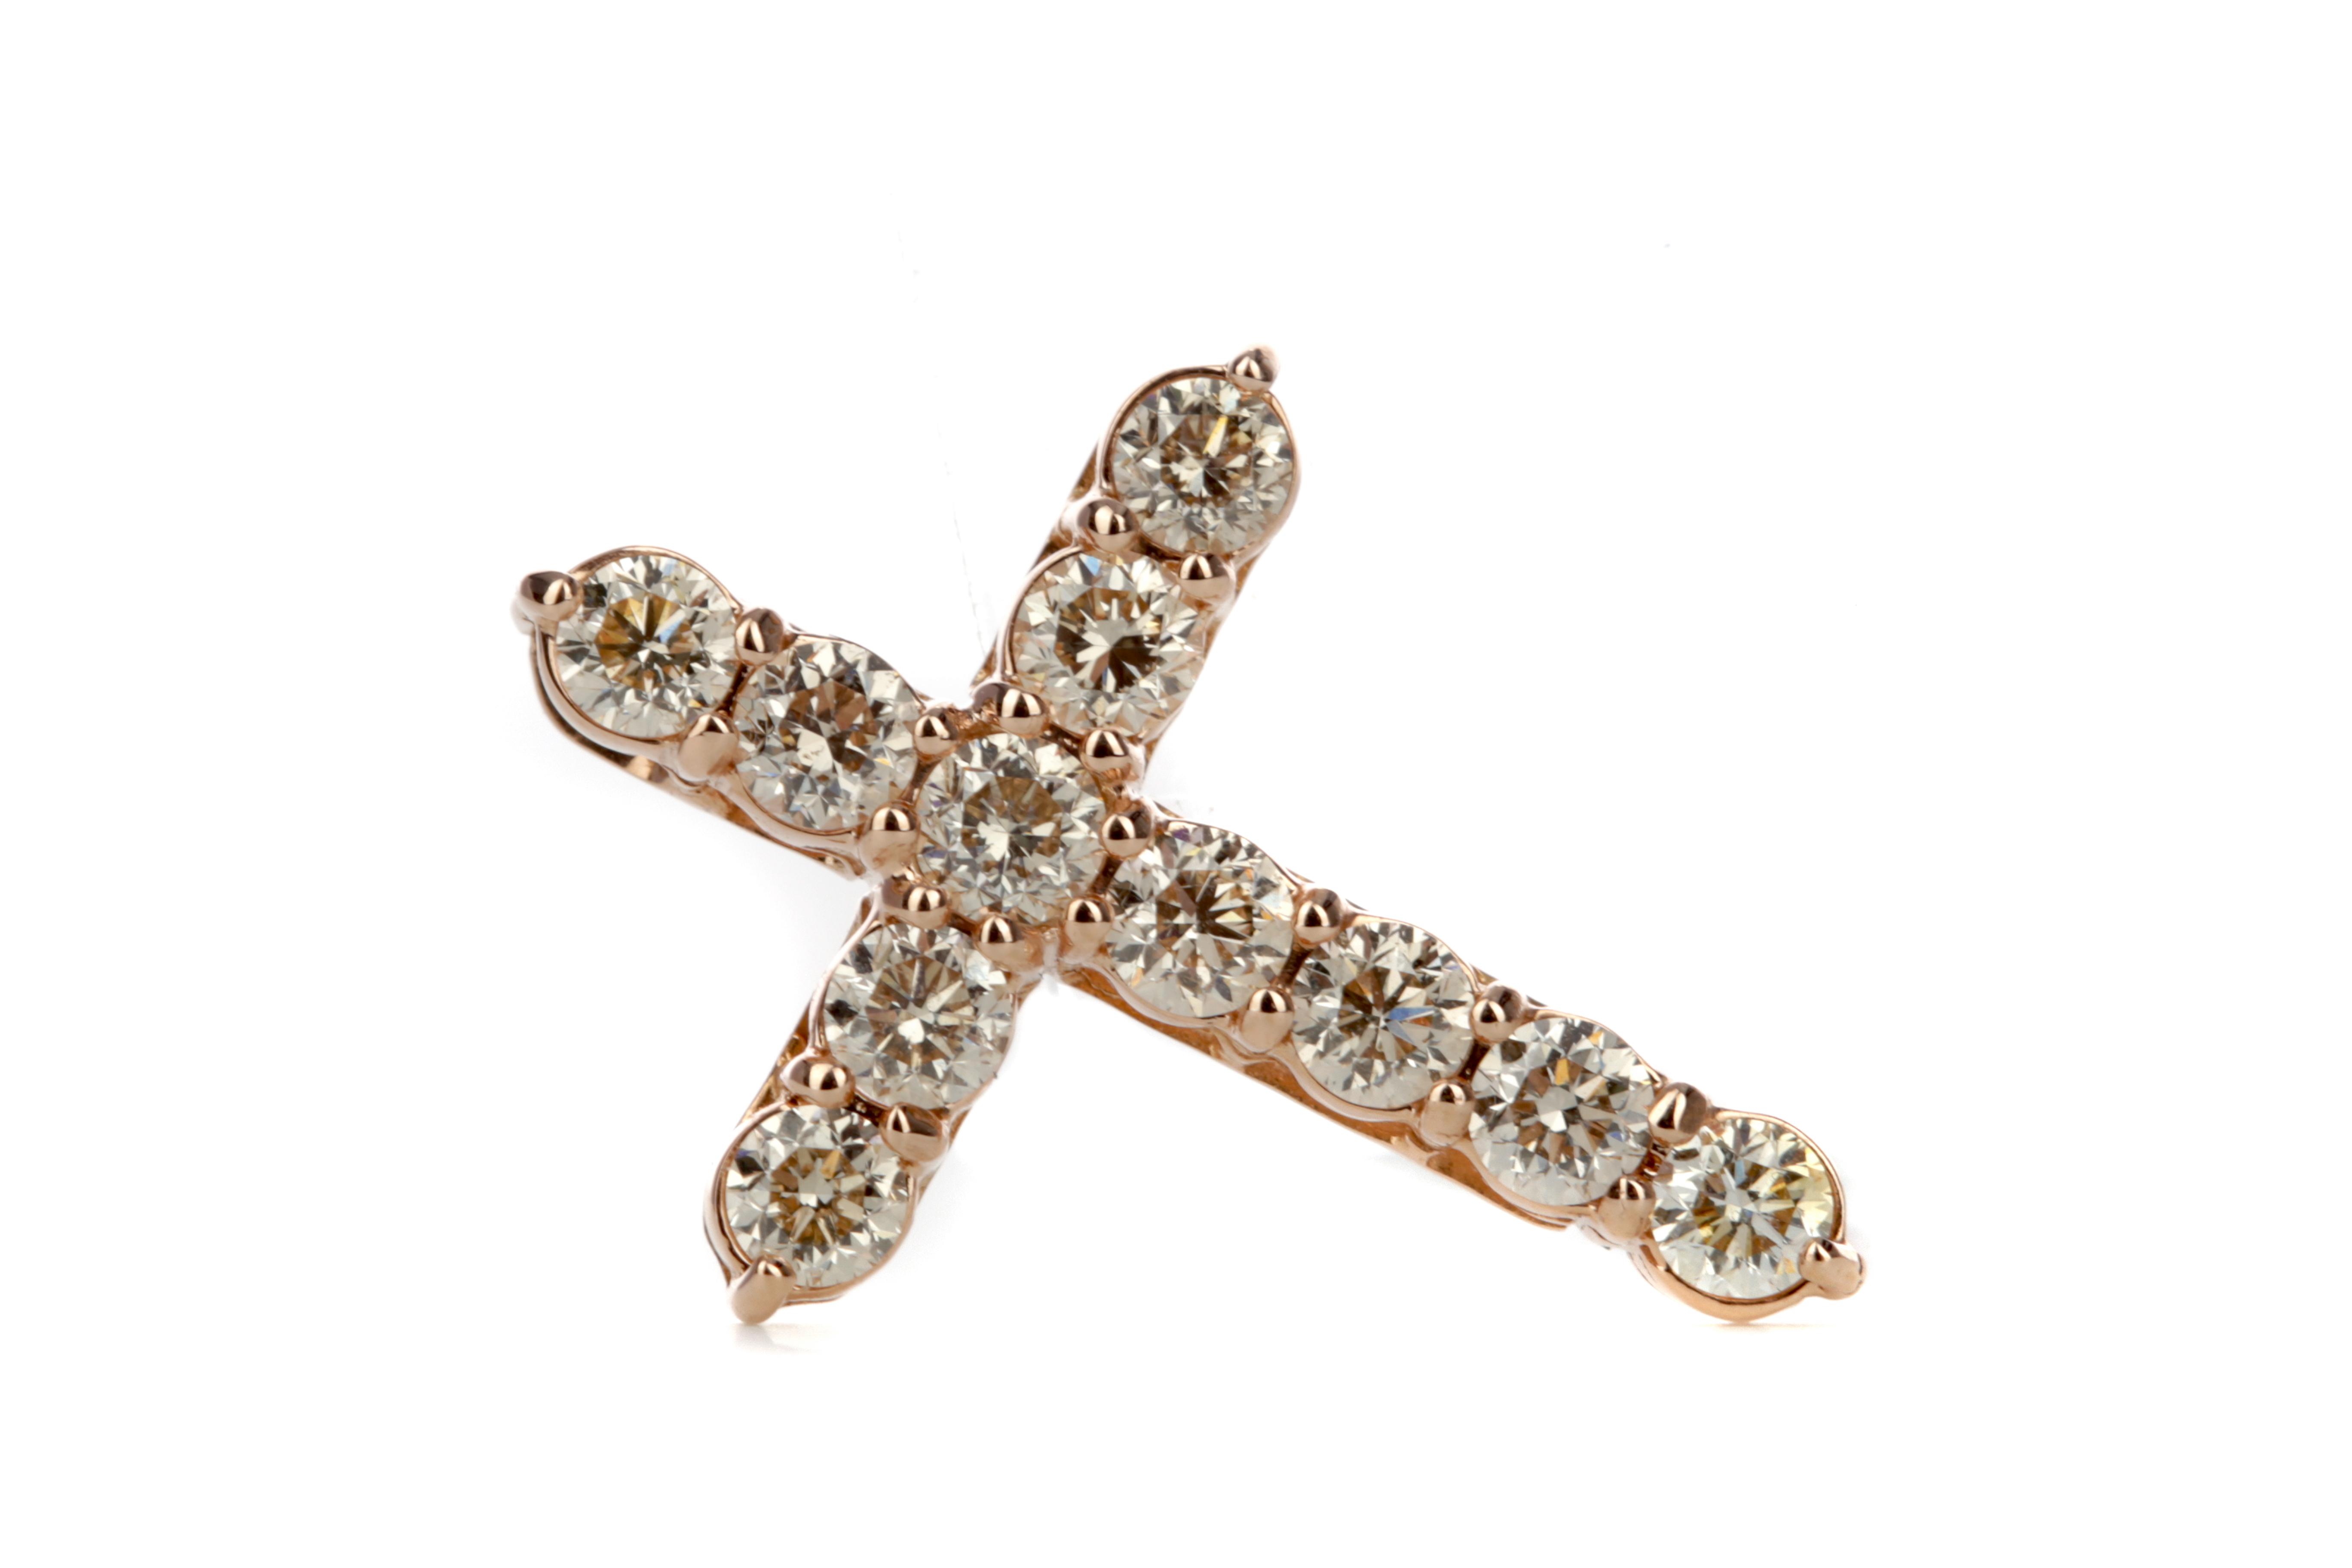 A ROSE GOLD DIAMOND CROSS PENDANT